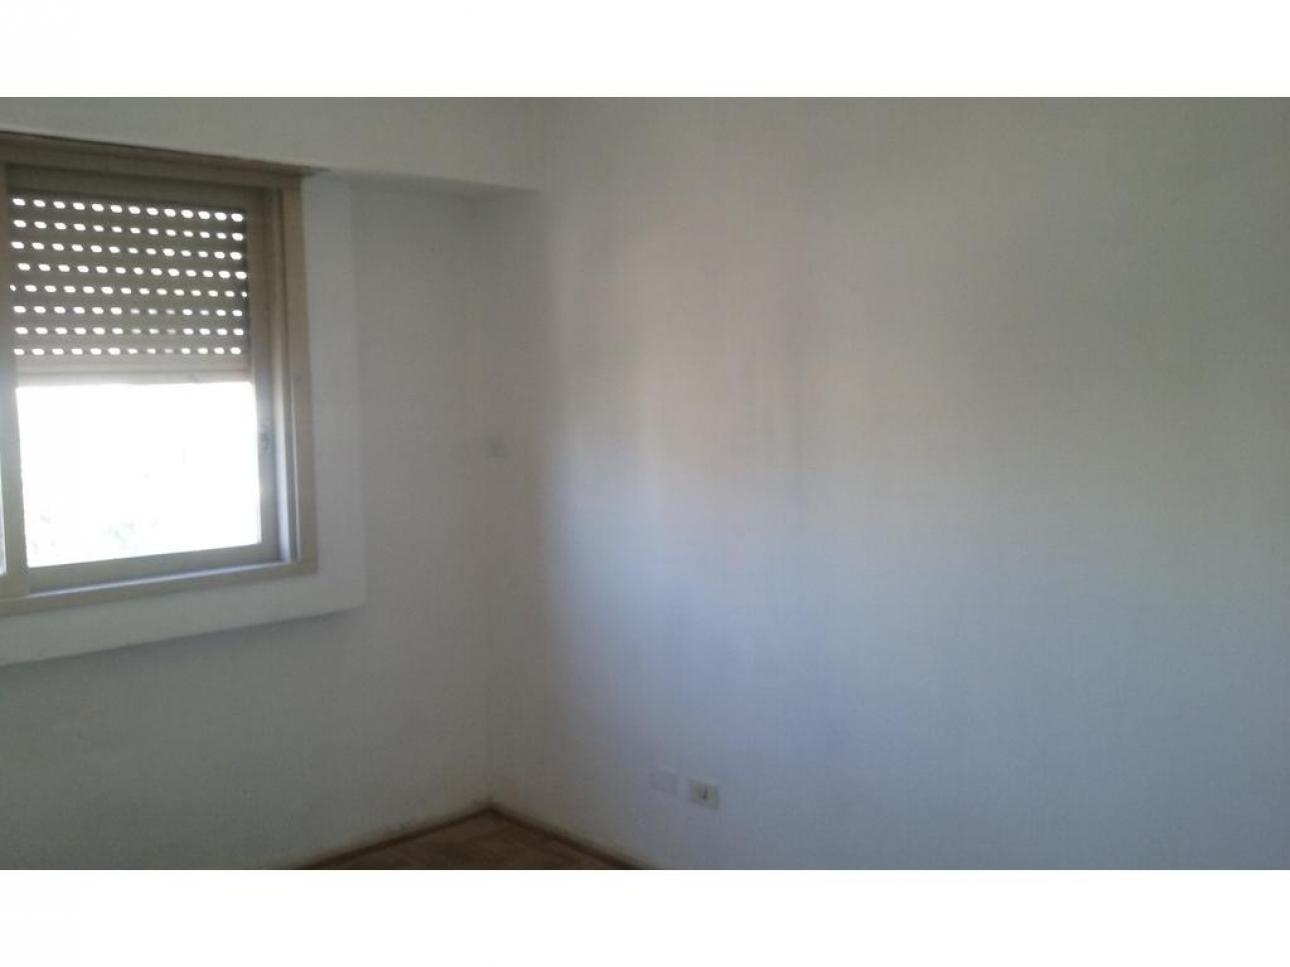 Alquiler de Departamento en   San Cristobal